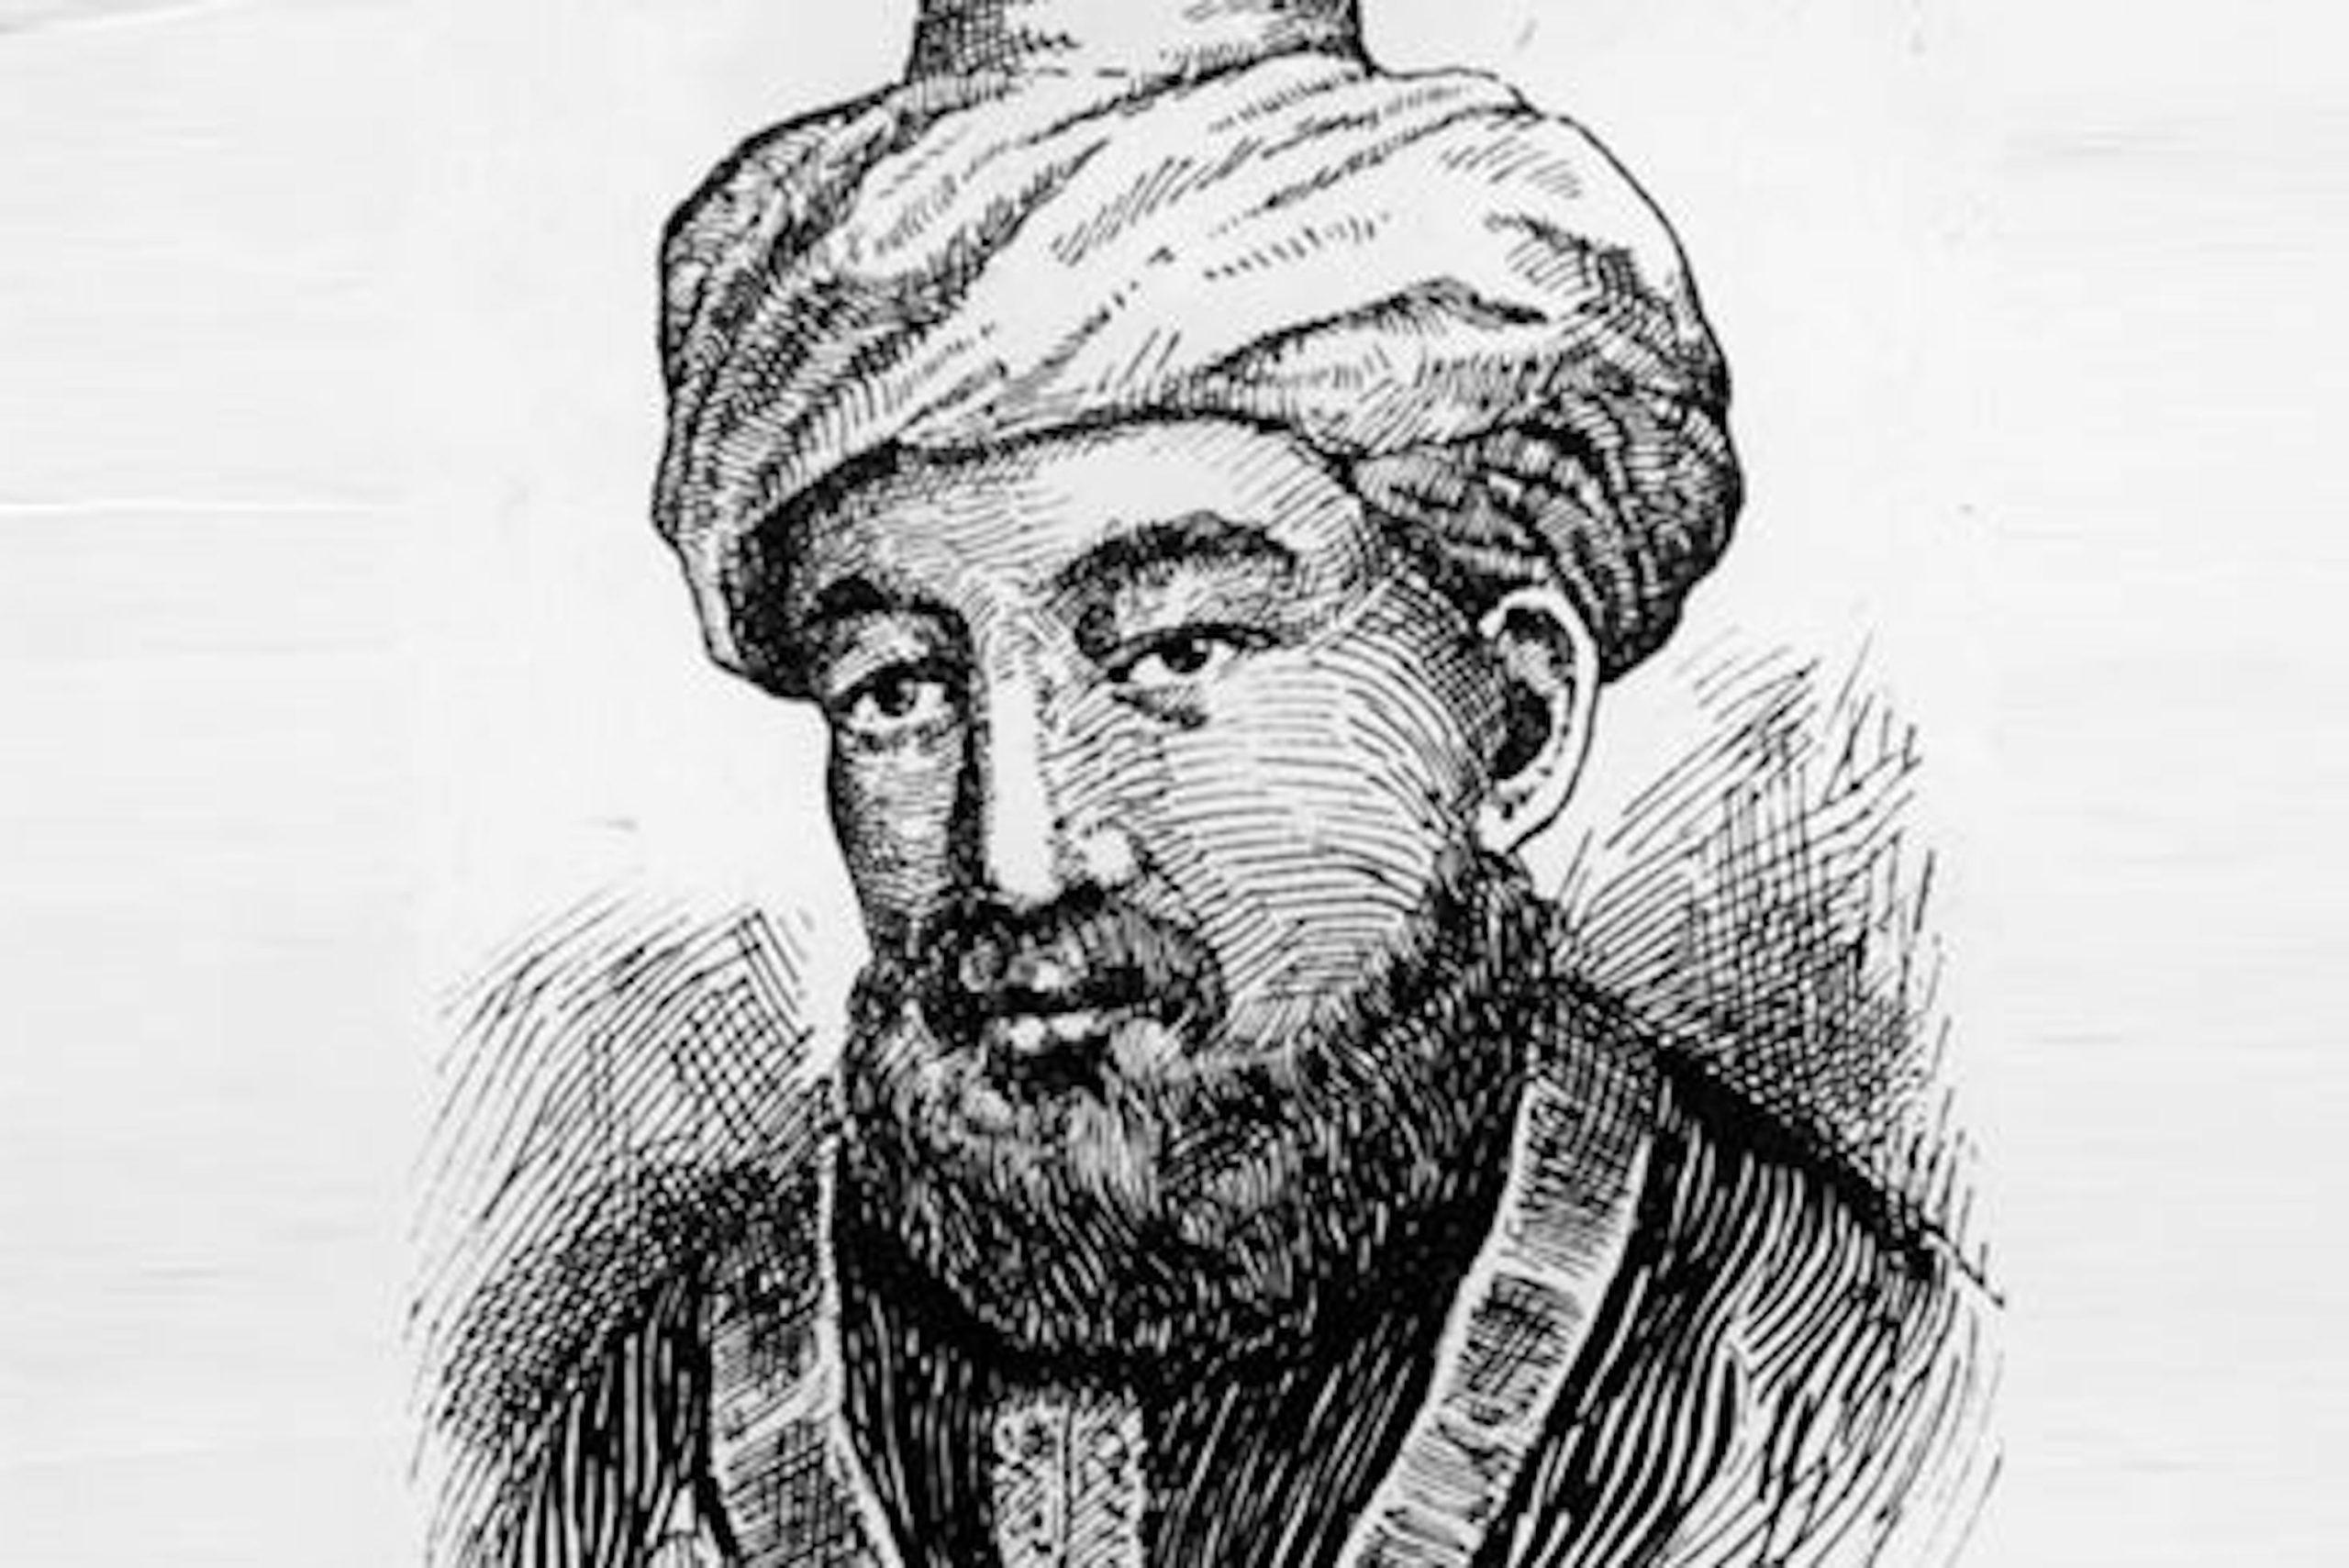 Maïmonide (Rambam), la contestation de la monarchie, avec Charles Meyer